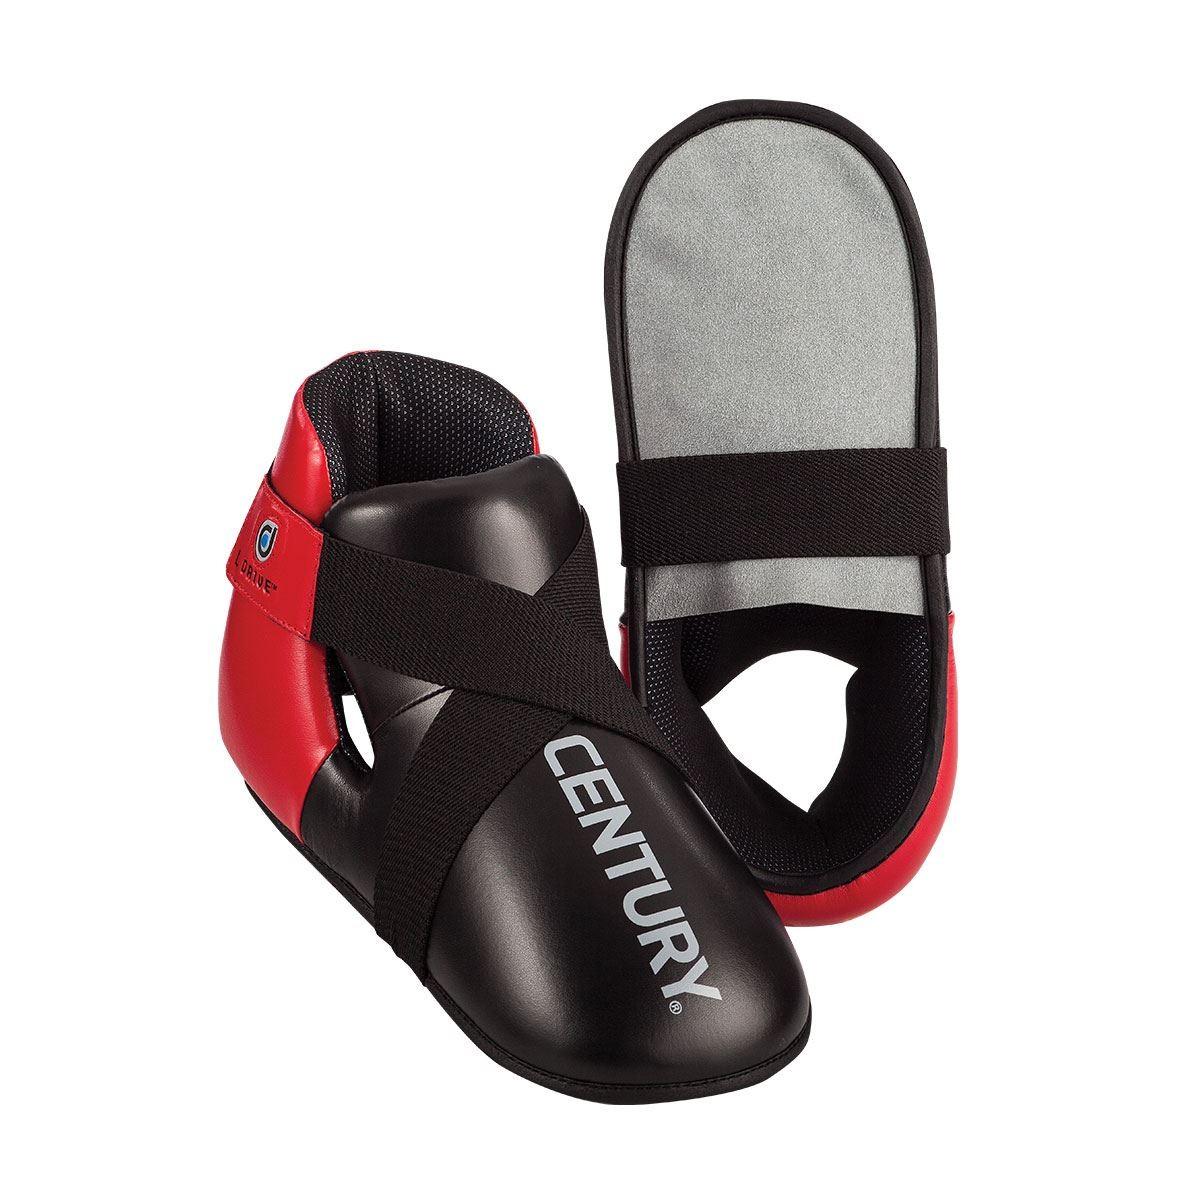 Century Martial Arts Drive Cross Training Boots